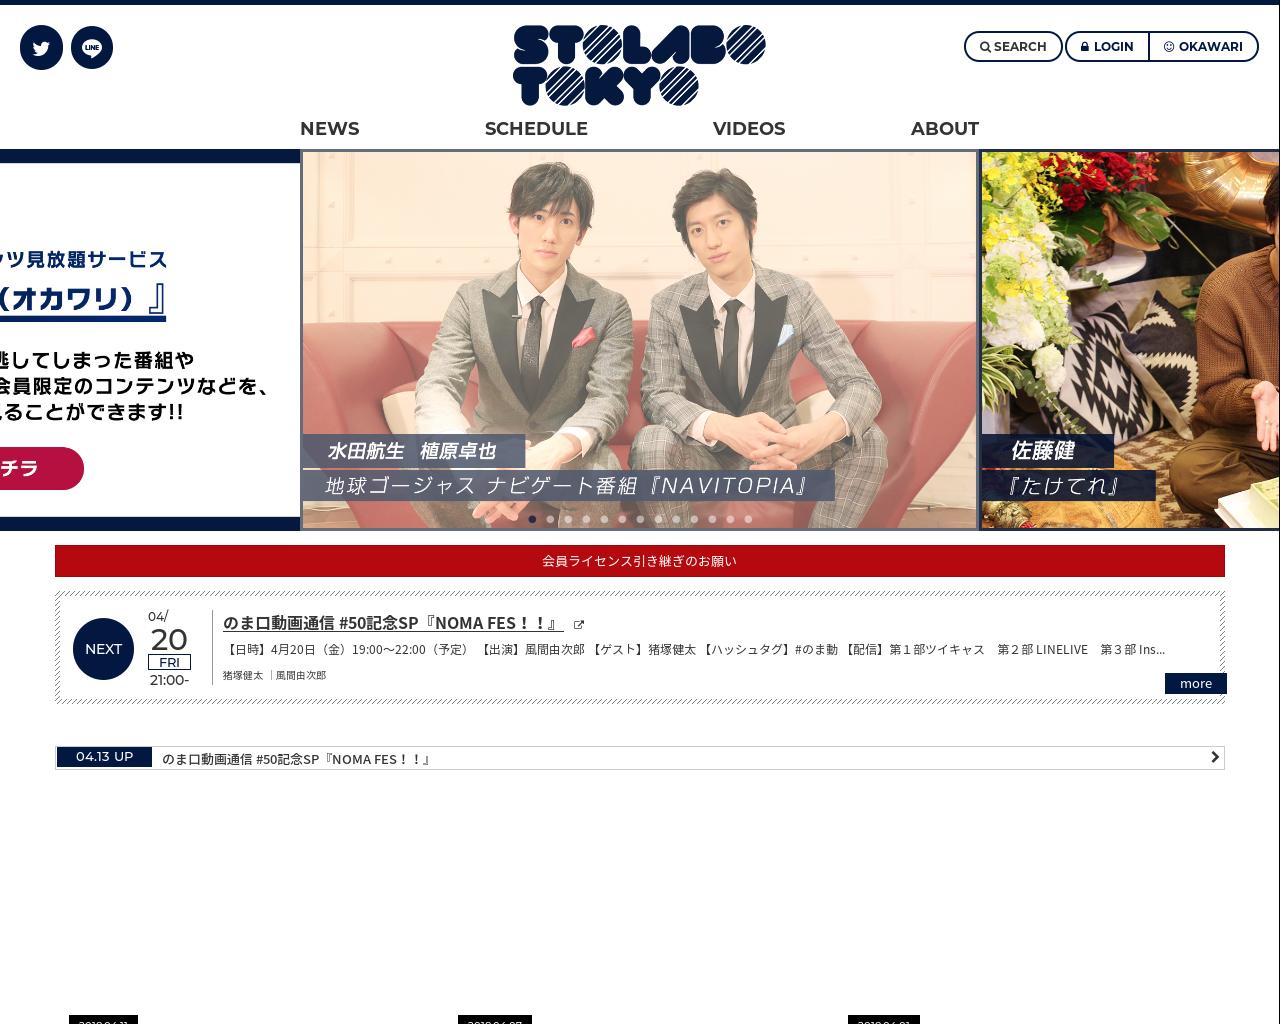 stolabo-tokyo.com(2018/04/16 02:10:45)